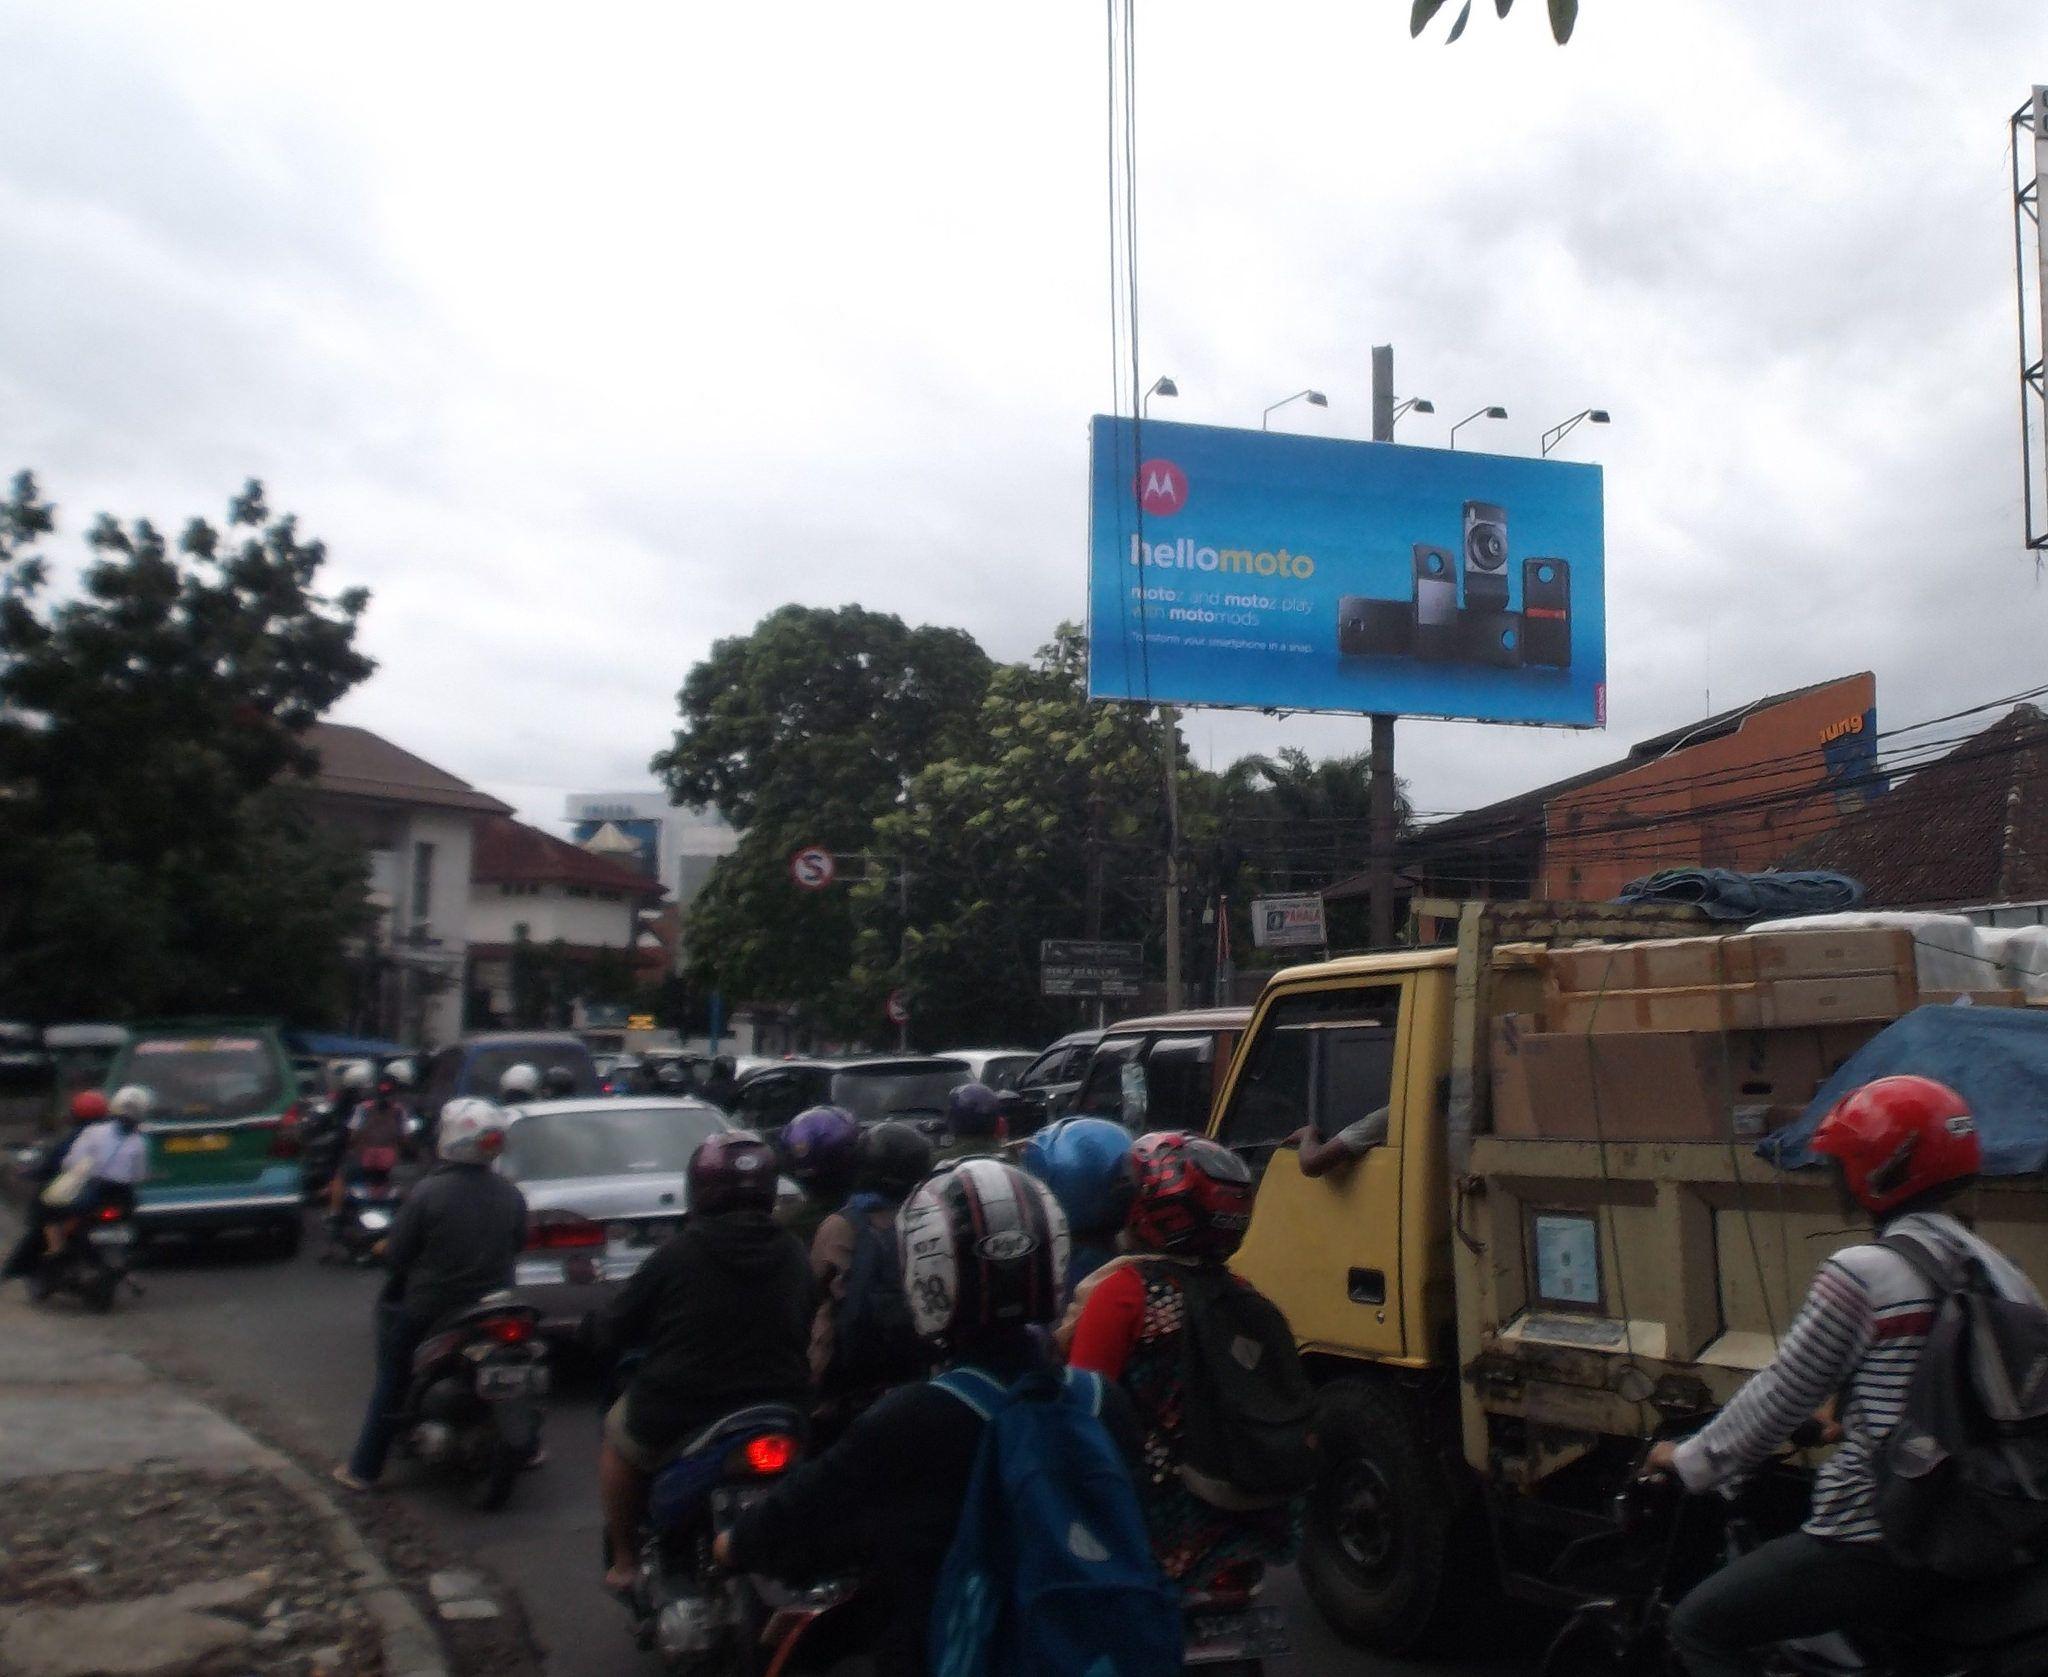 Https Www Flickr Com Photos Bandungmediaoutdoor Shares 350u79  # Muebles Diz Callon